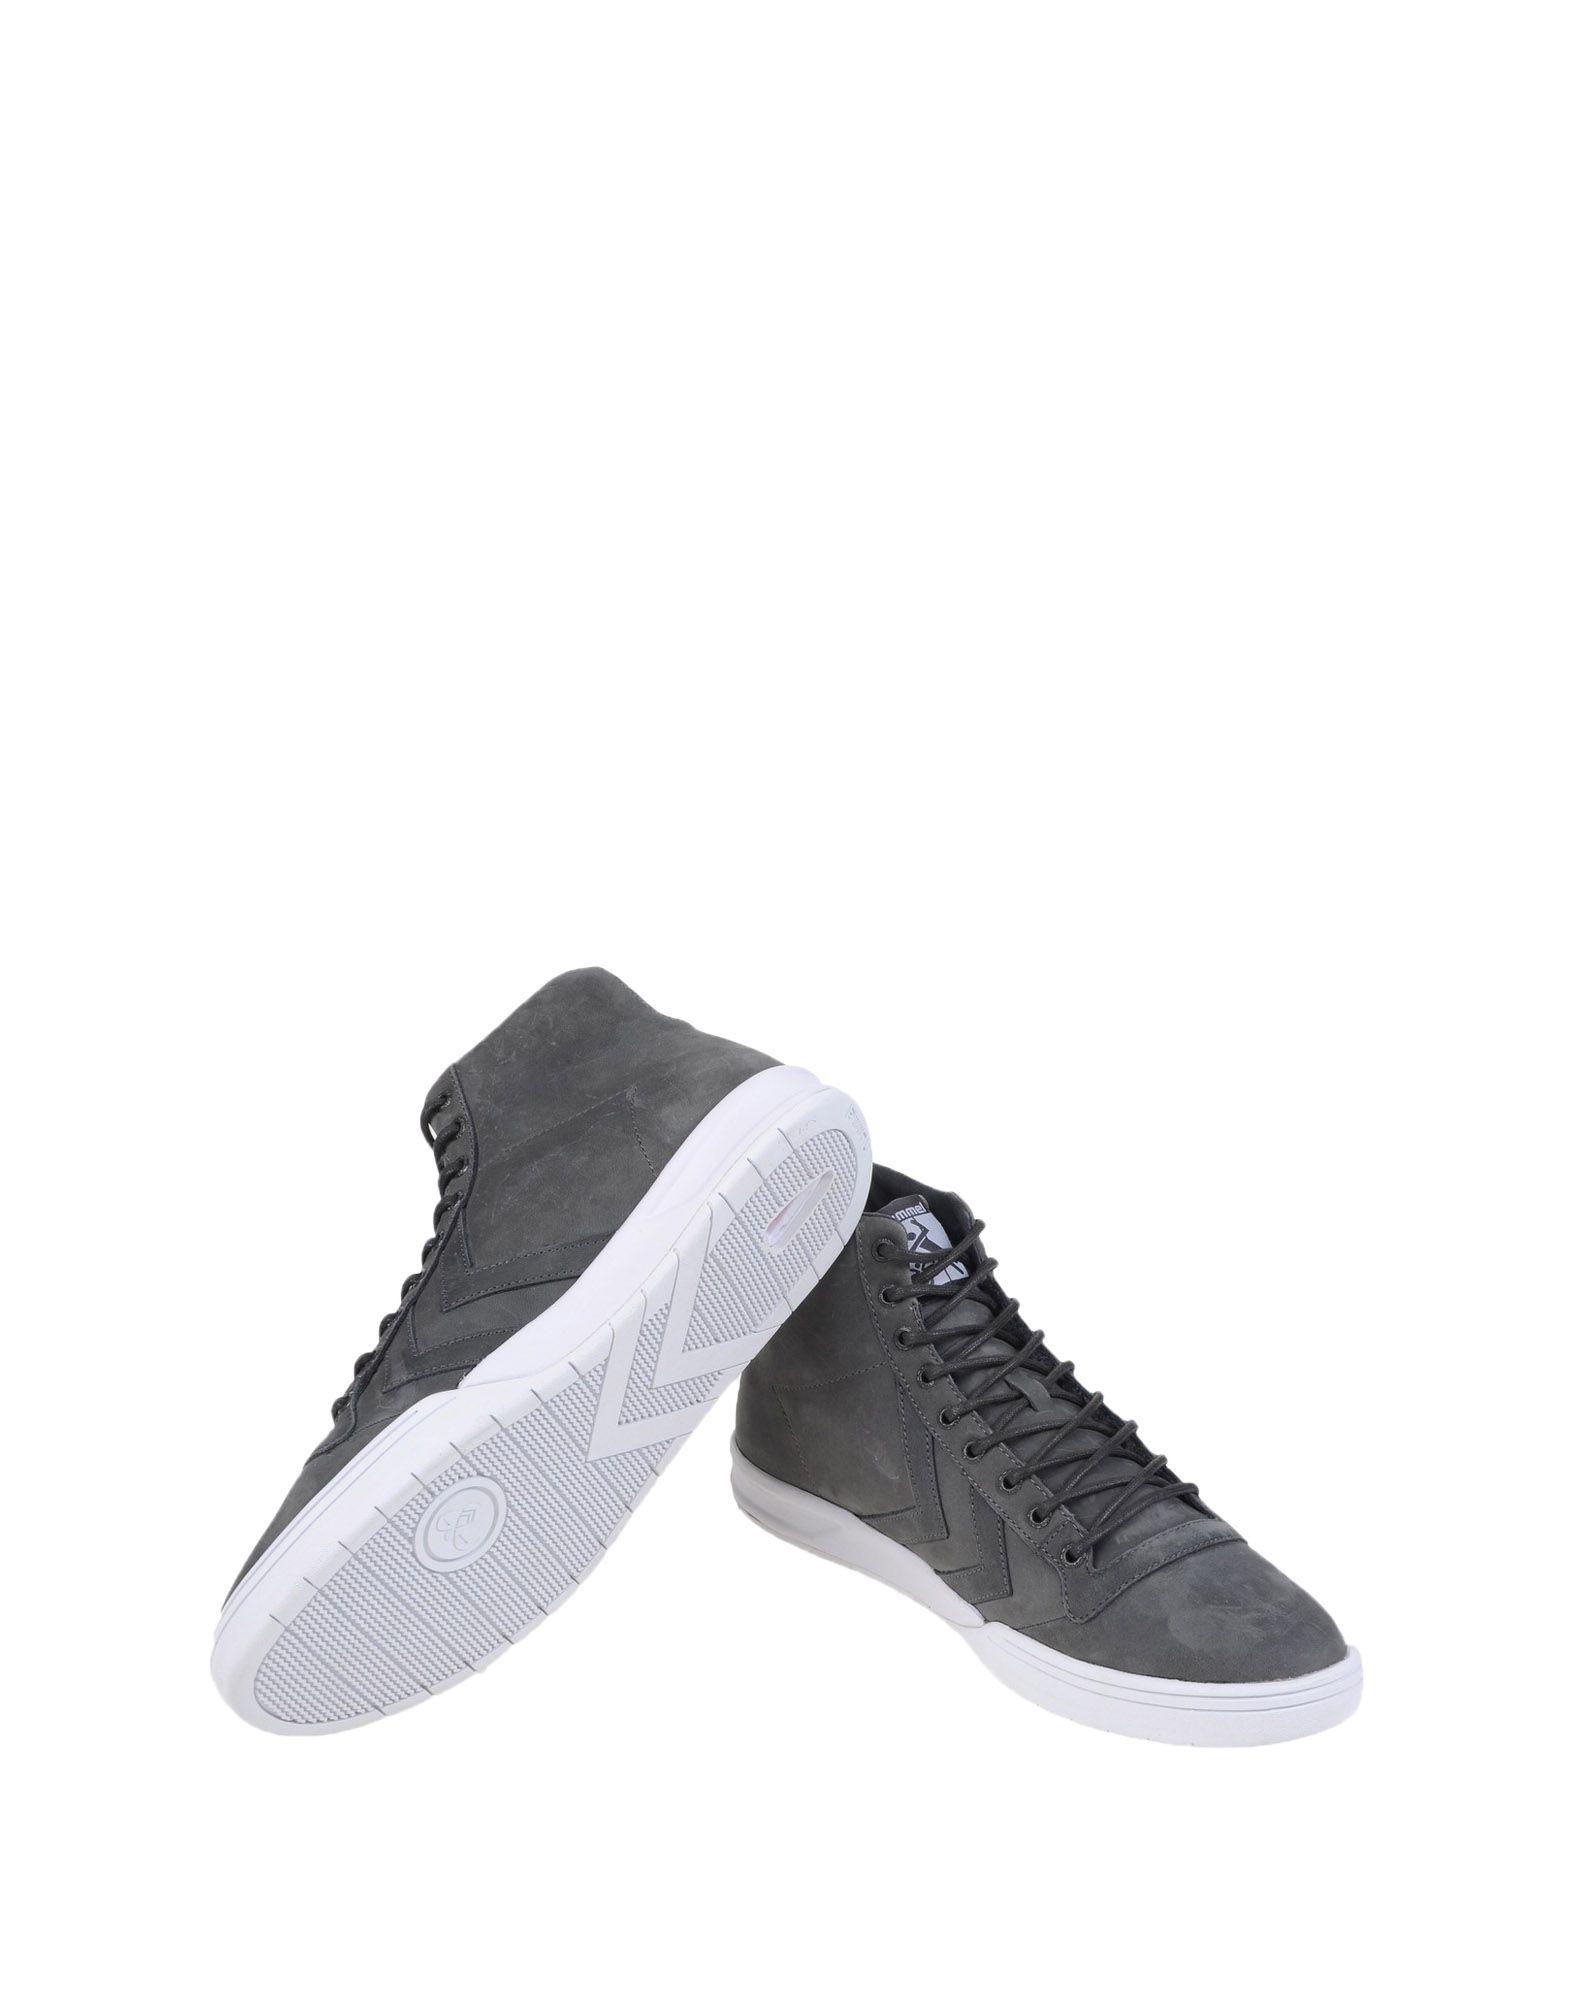 Sneakers Hummel Hml Stadil Winter High Sneaker - Homme - Sneakers Hummel sur